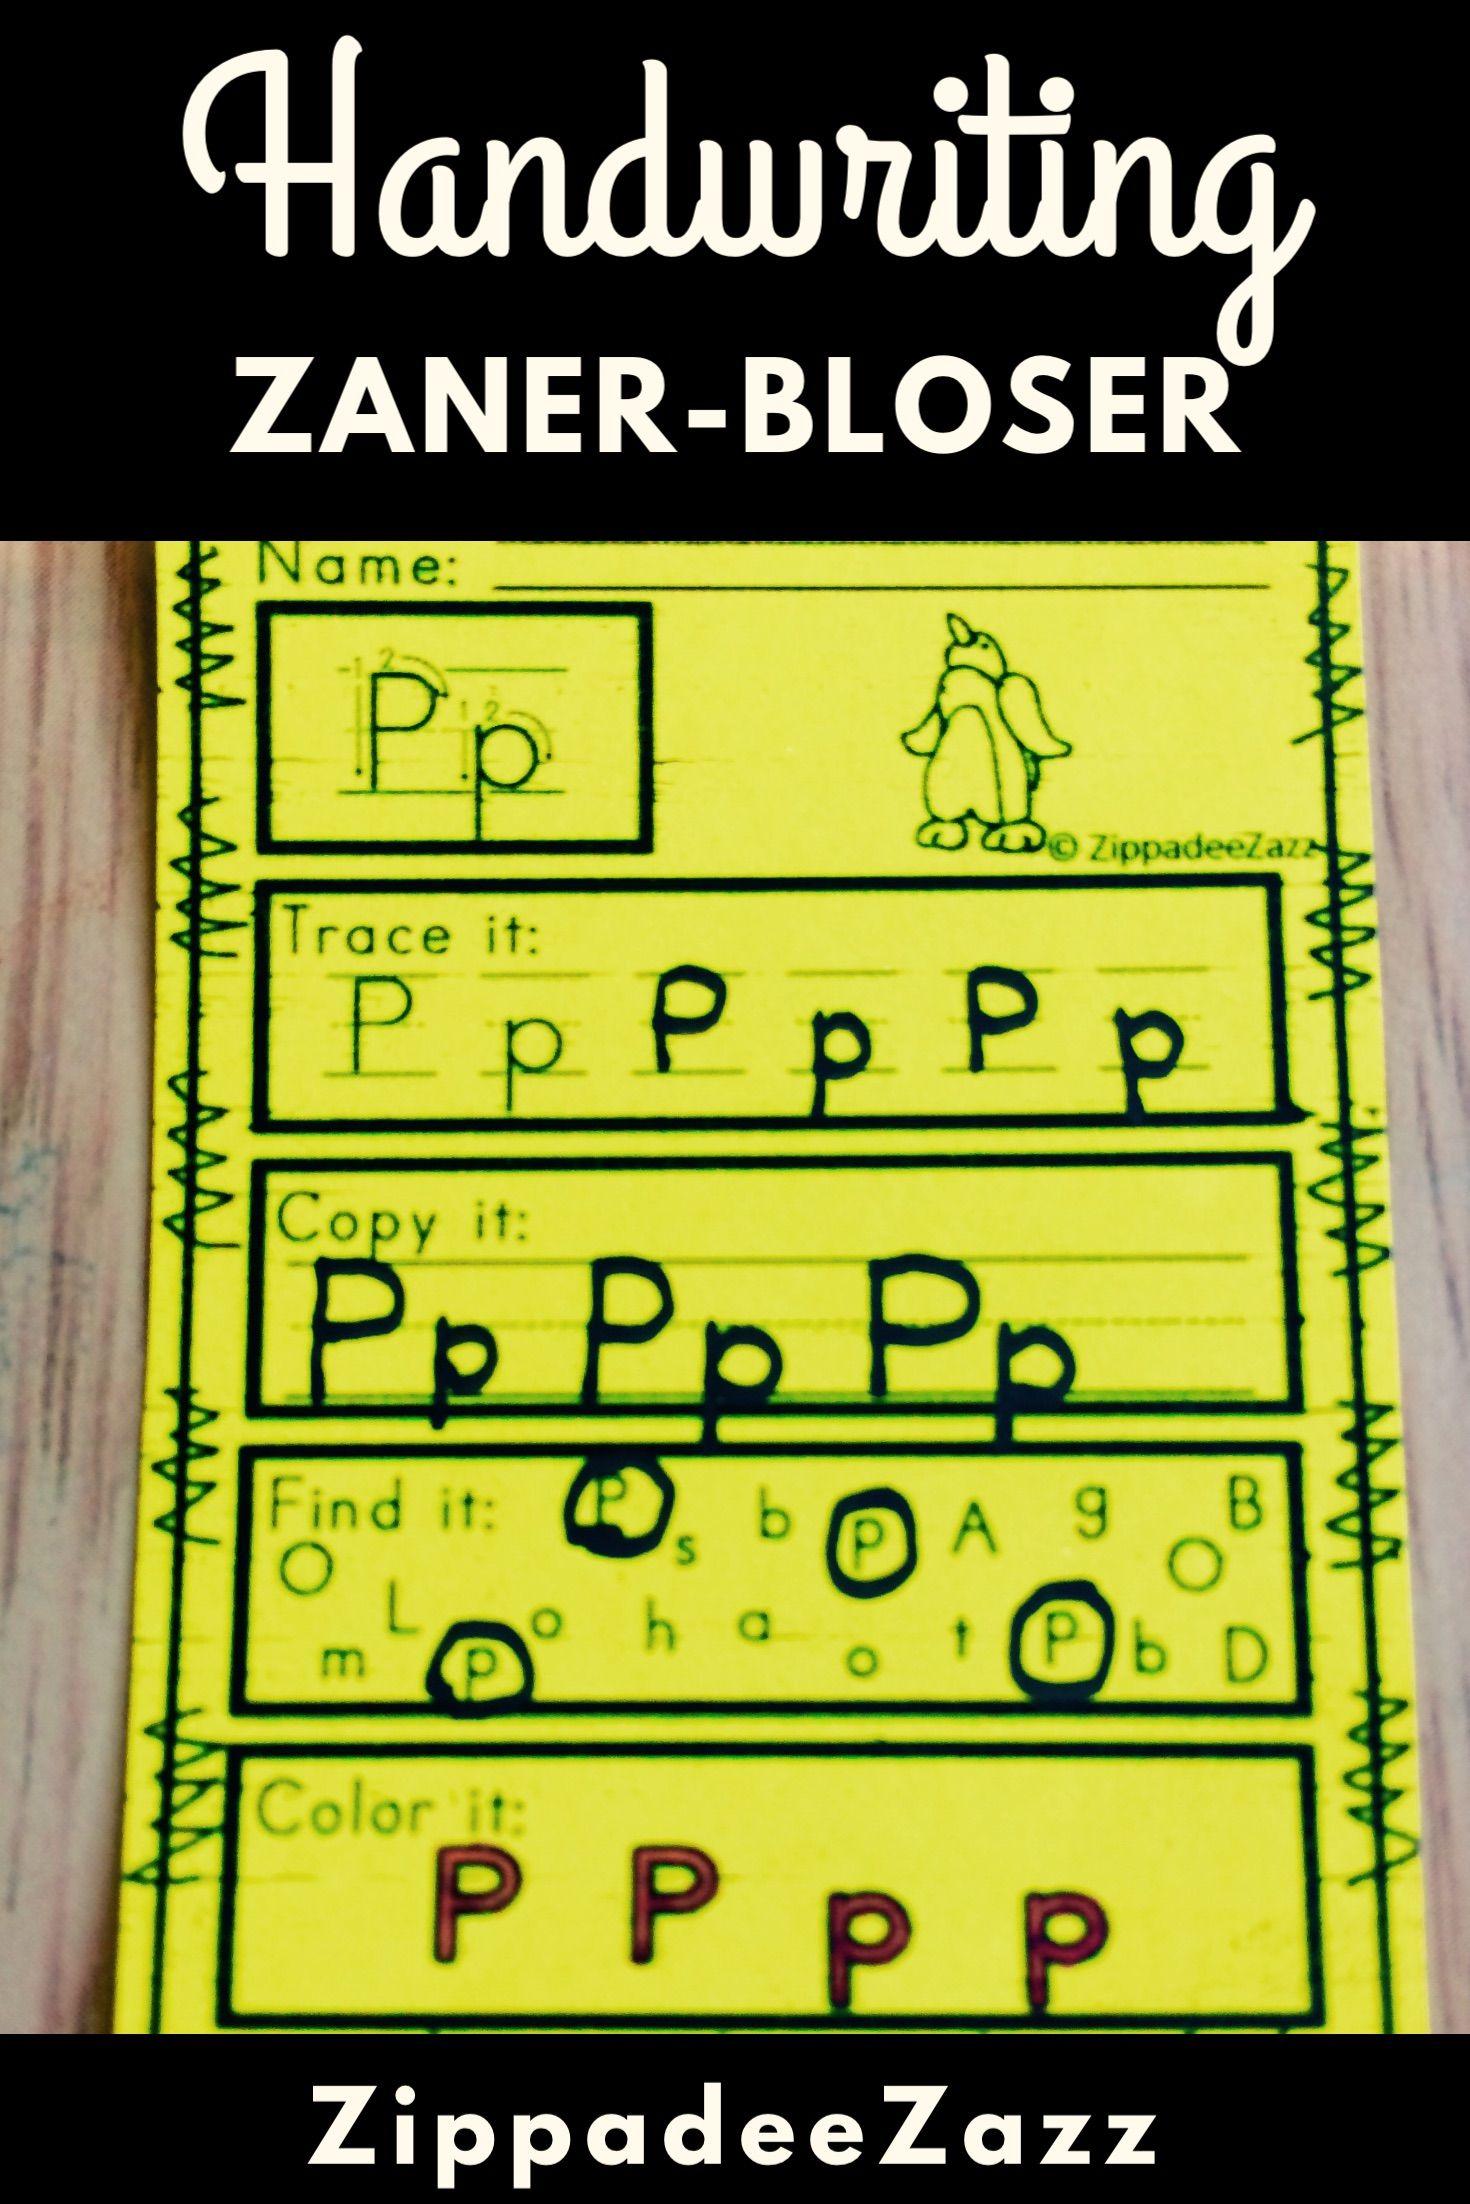 Worksheets Zaner Bloser Handwriting Worksheets worksheets for zaner bloser handwriting practice practice